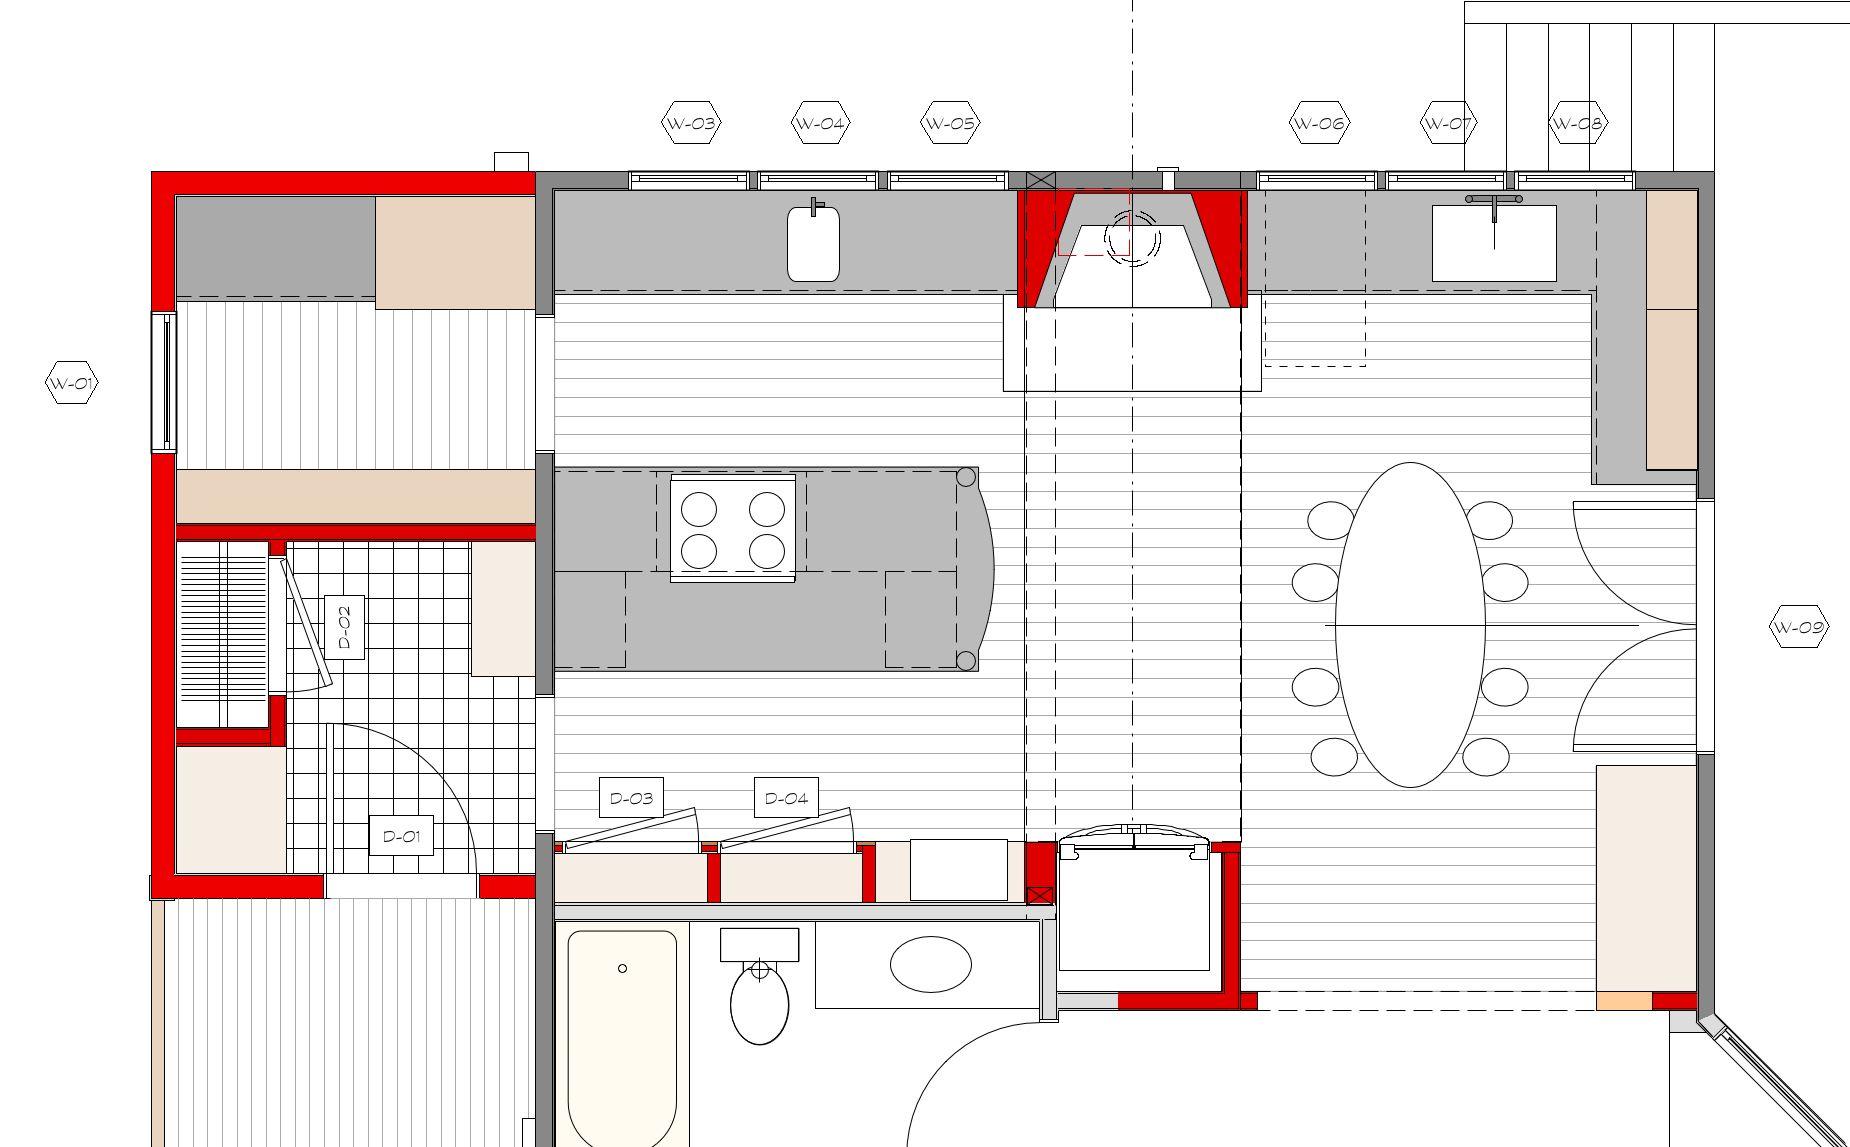 rifton kitchen plan.jpg